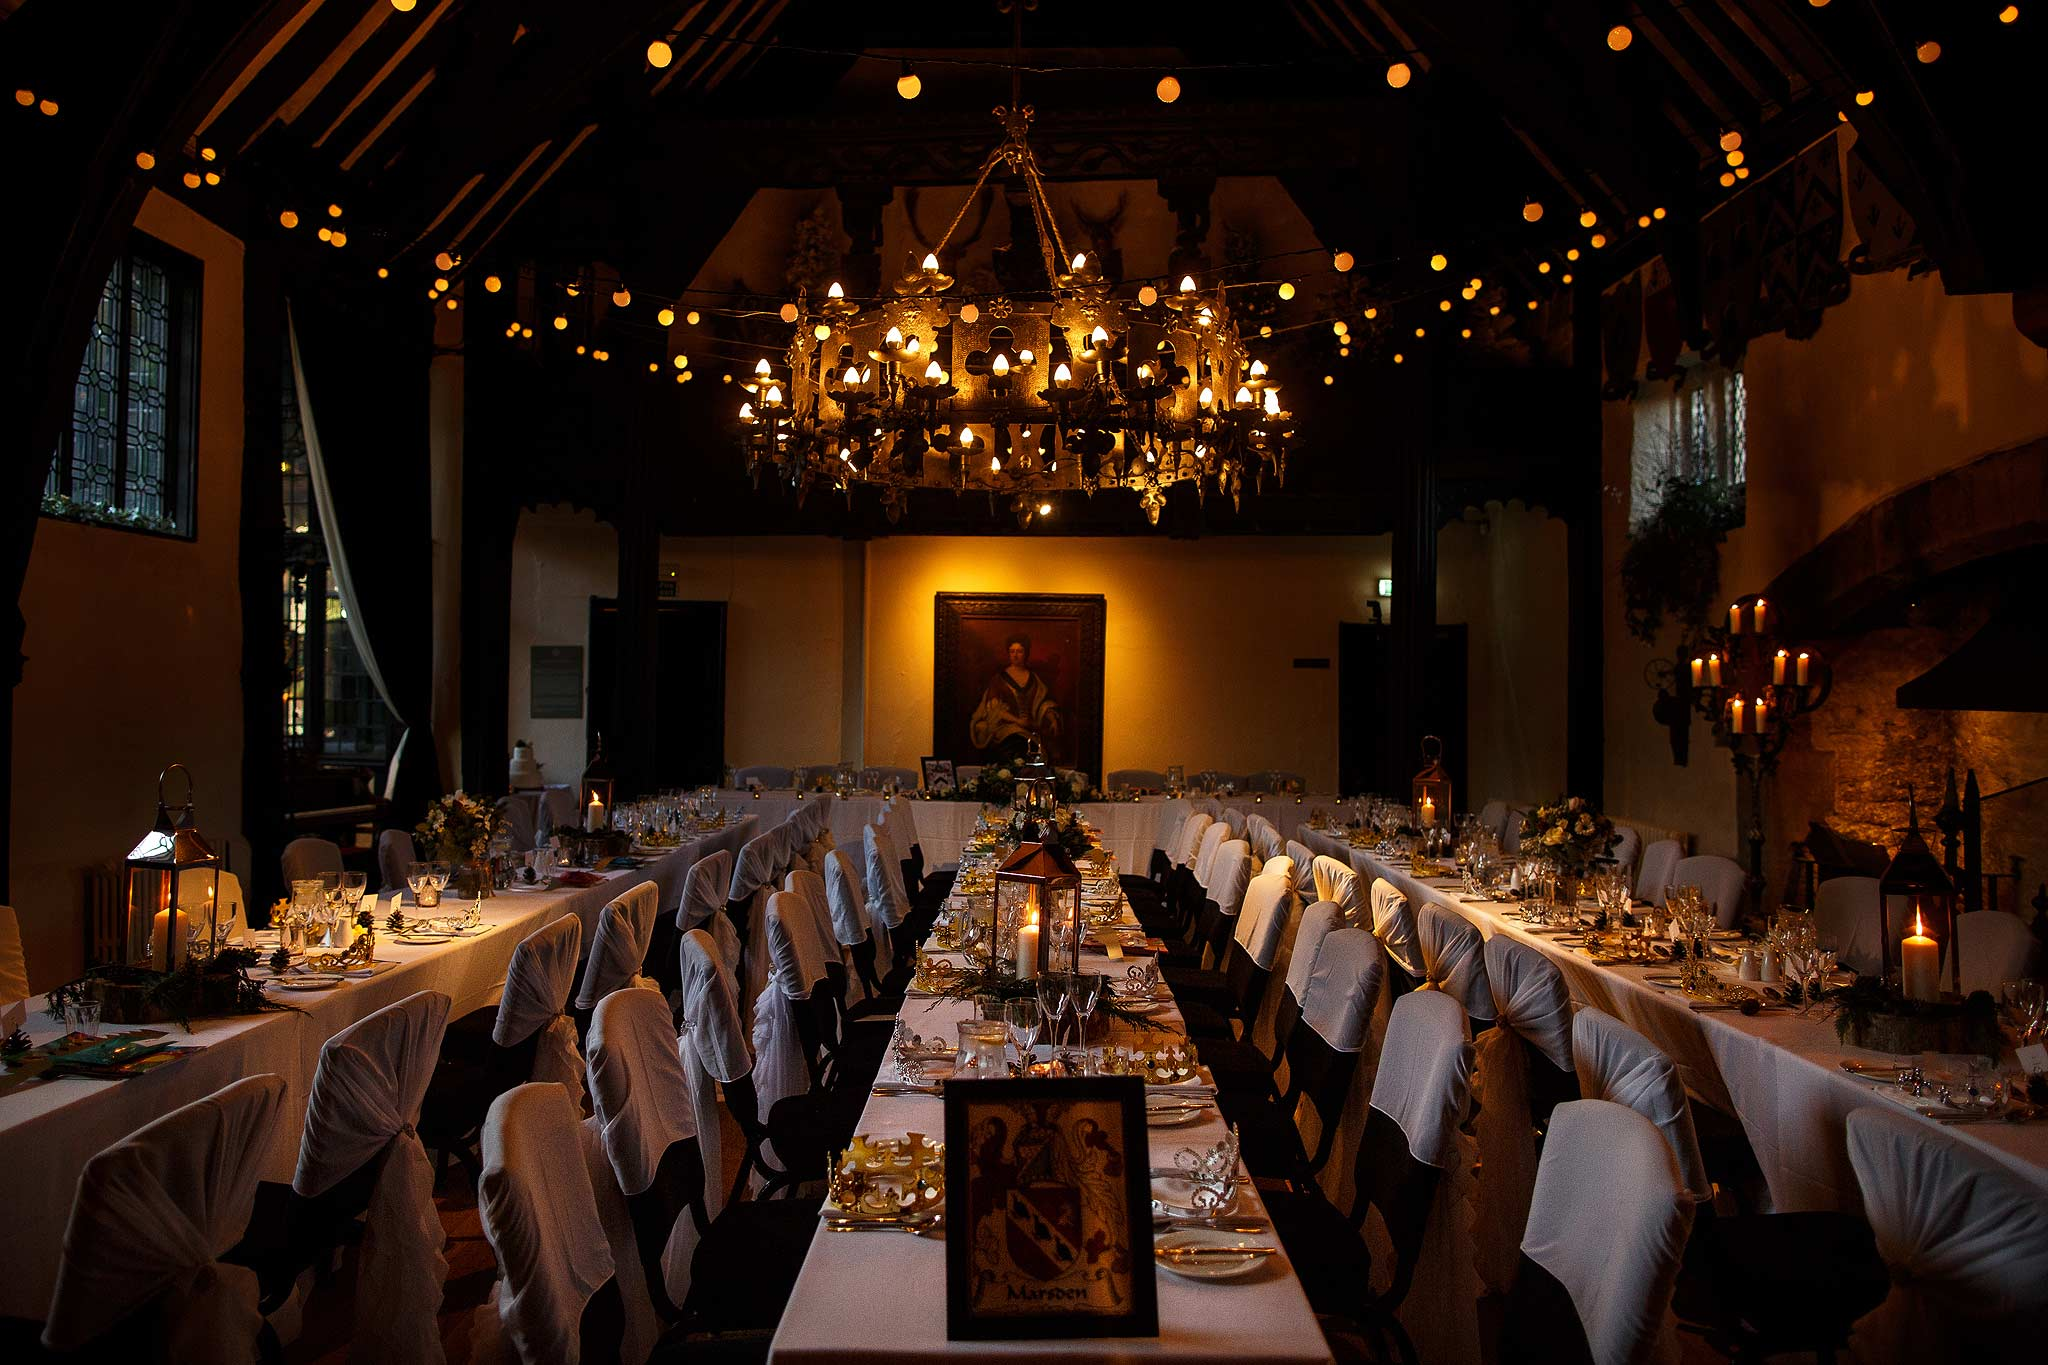 Photograph of the interoir banquet seating layout at Samlesbury Hall